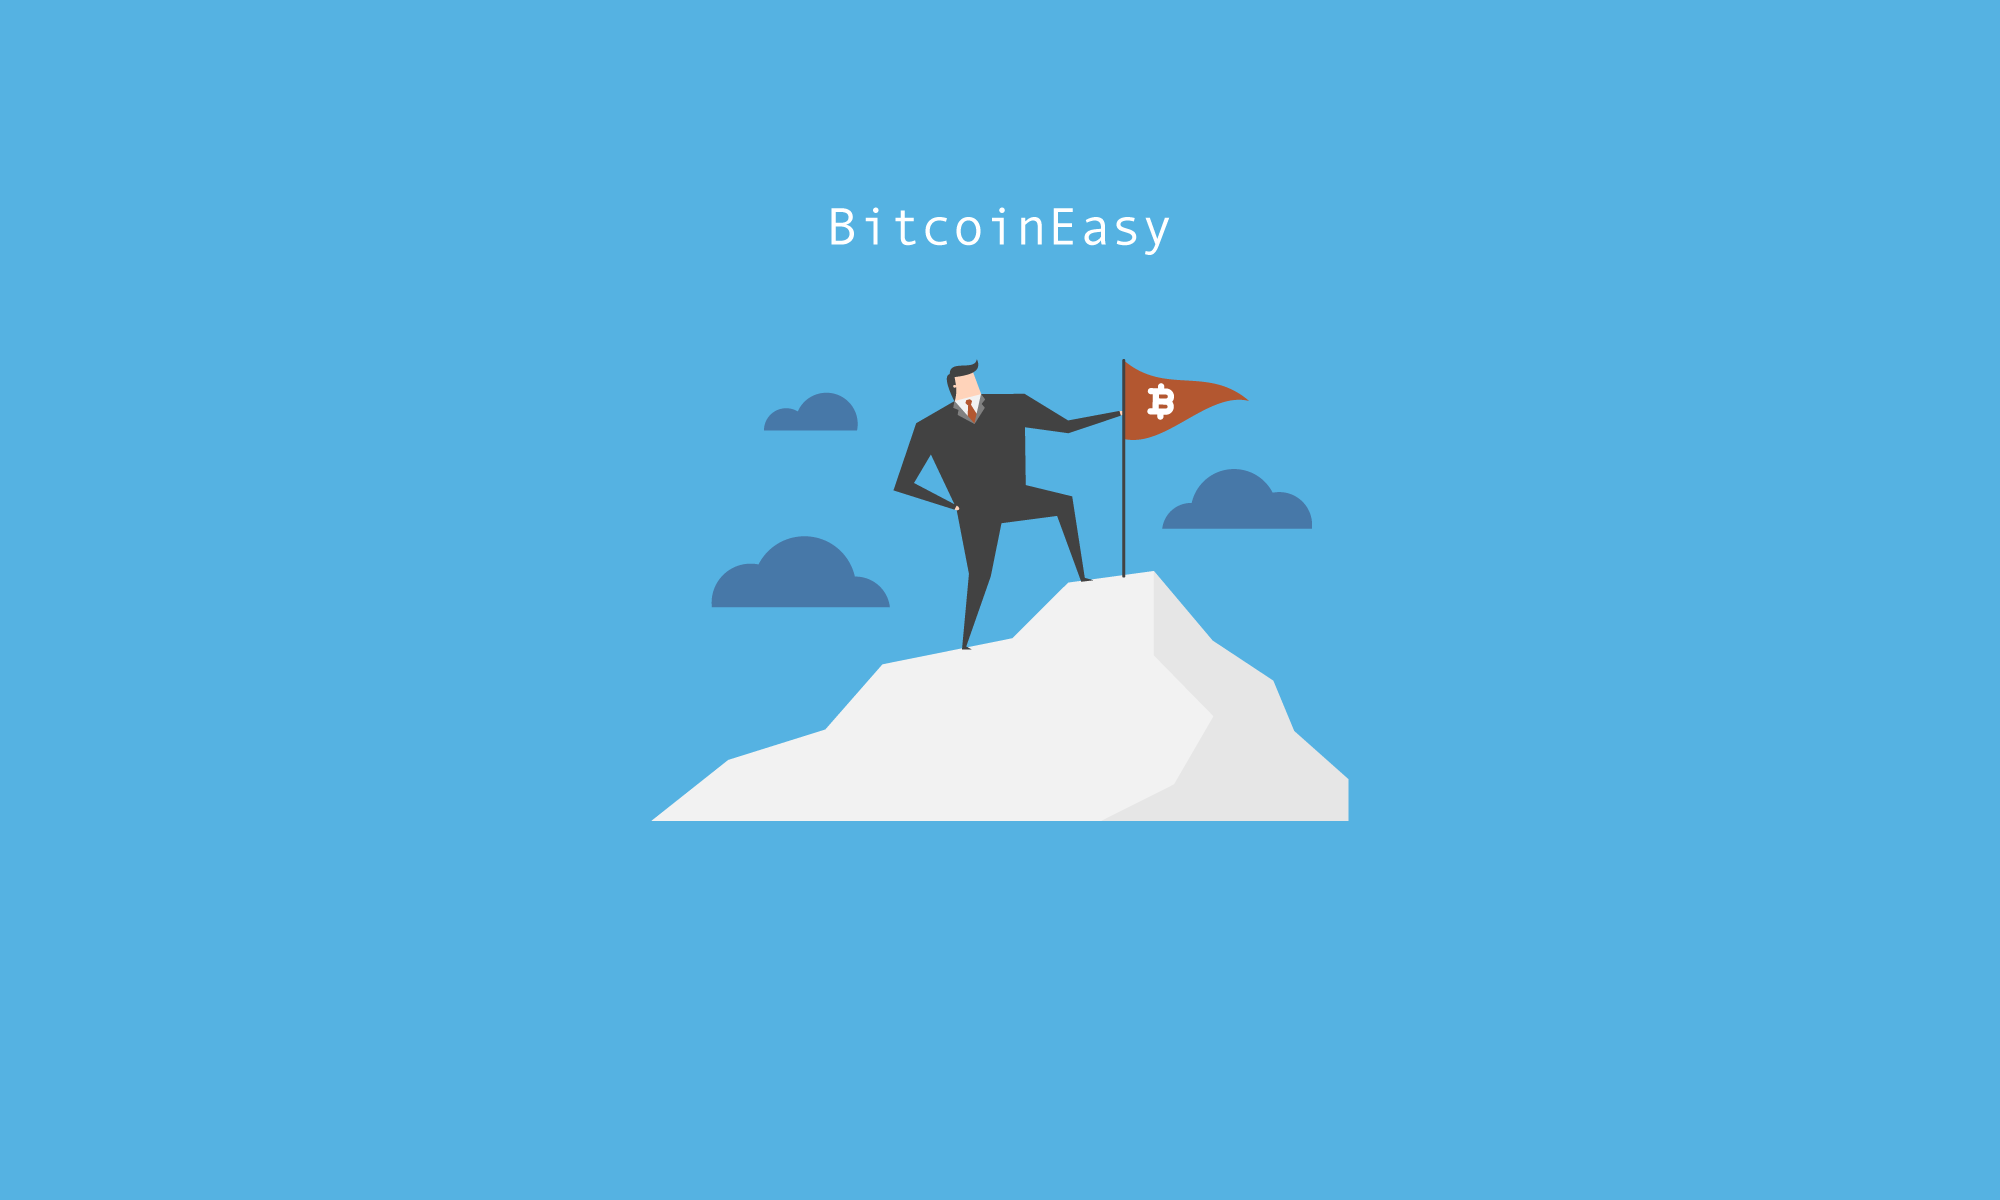 Bitcoin Easy